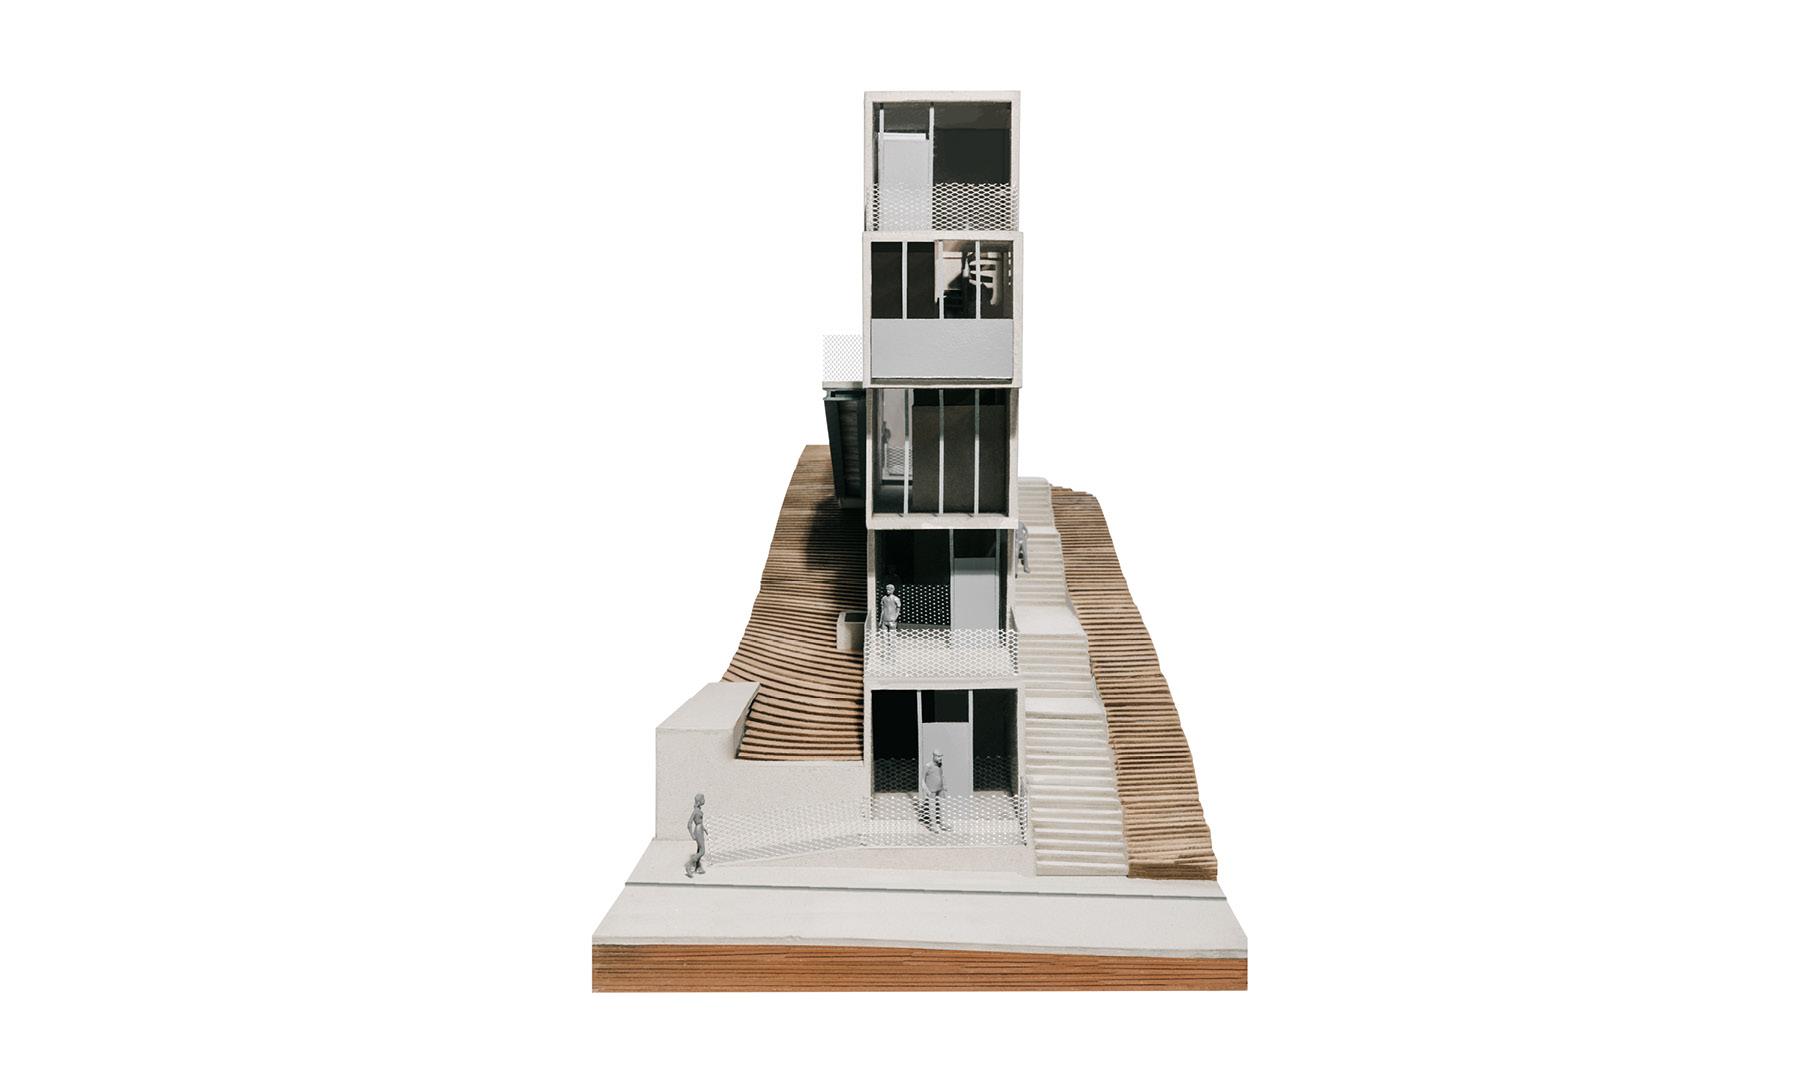 MUTUO-Boyle tower model-74_carousel